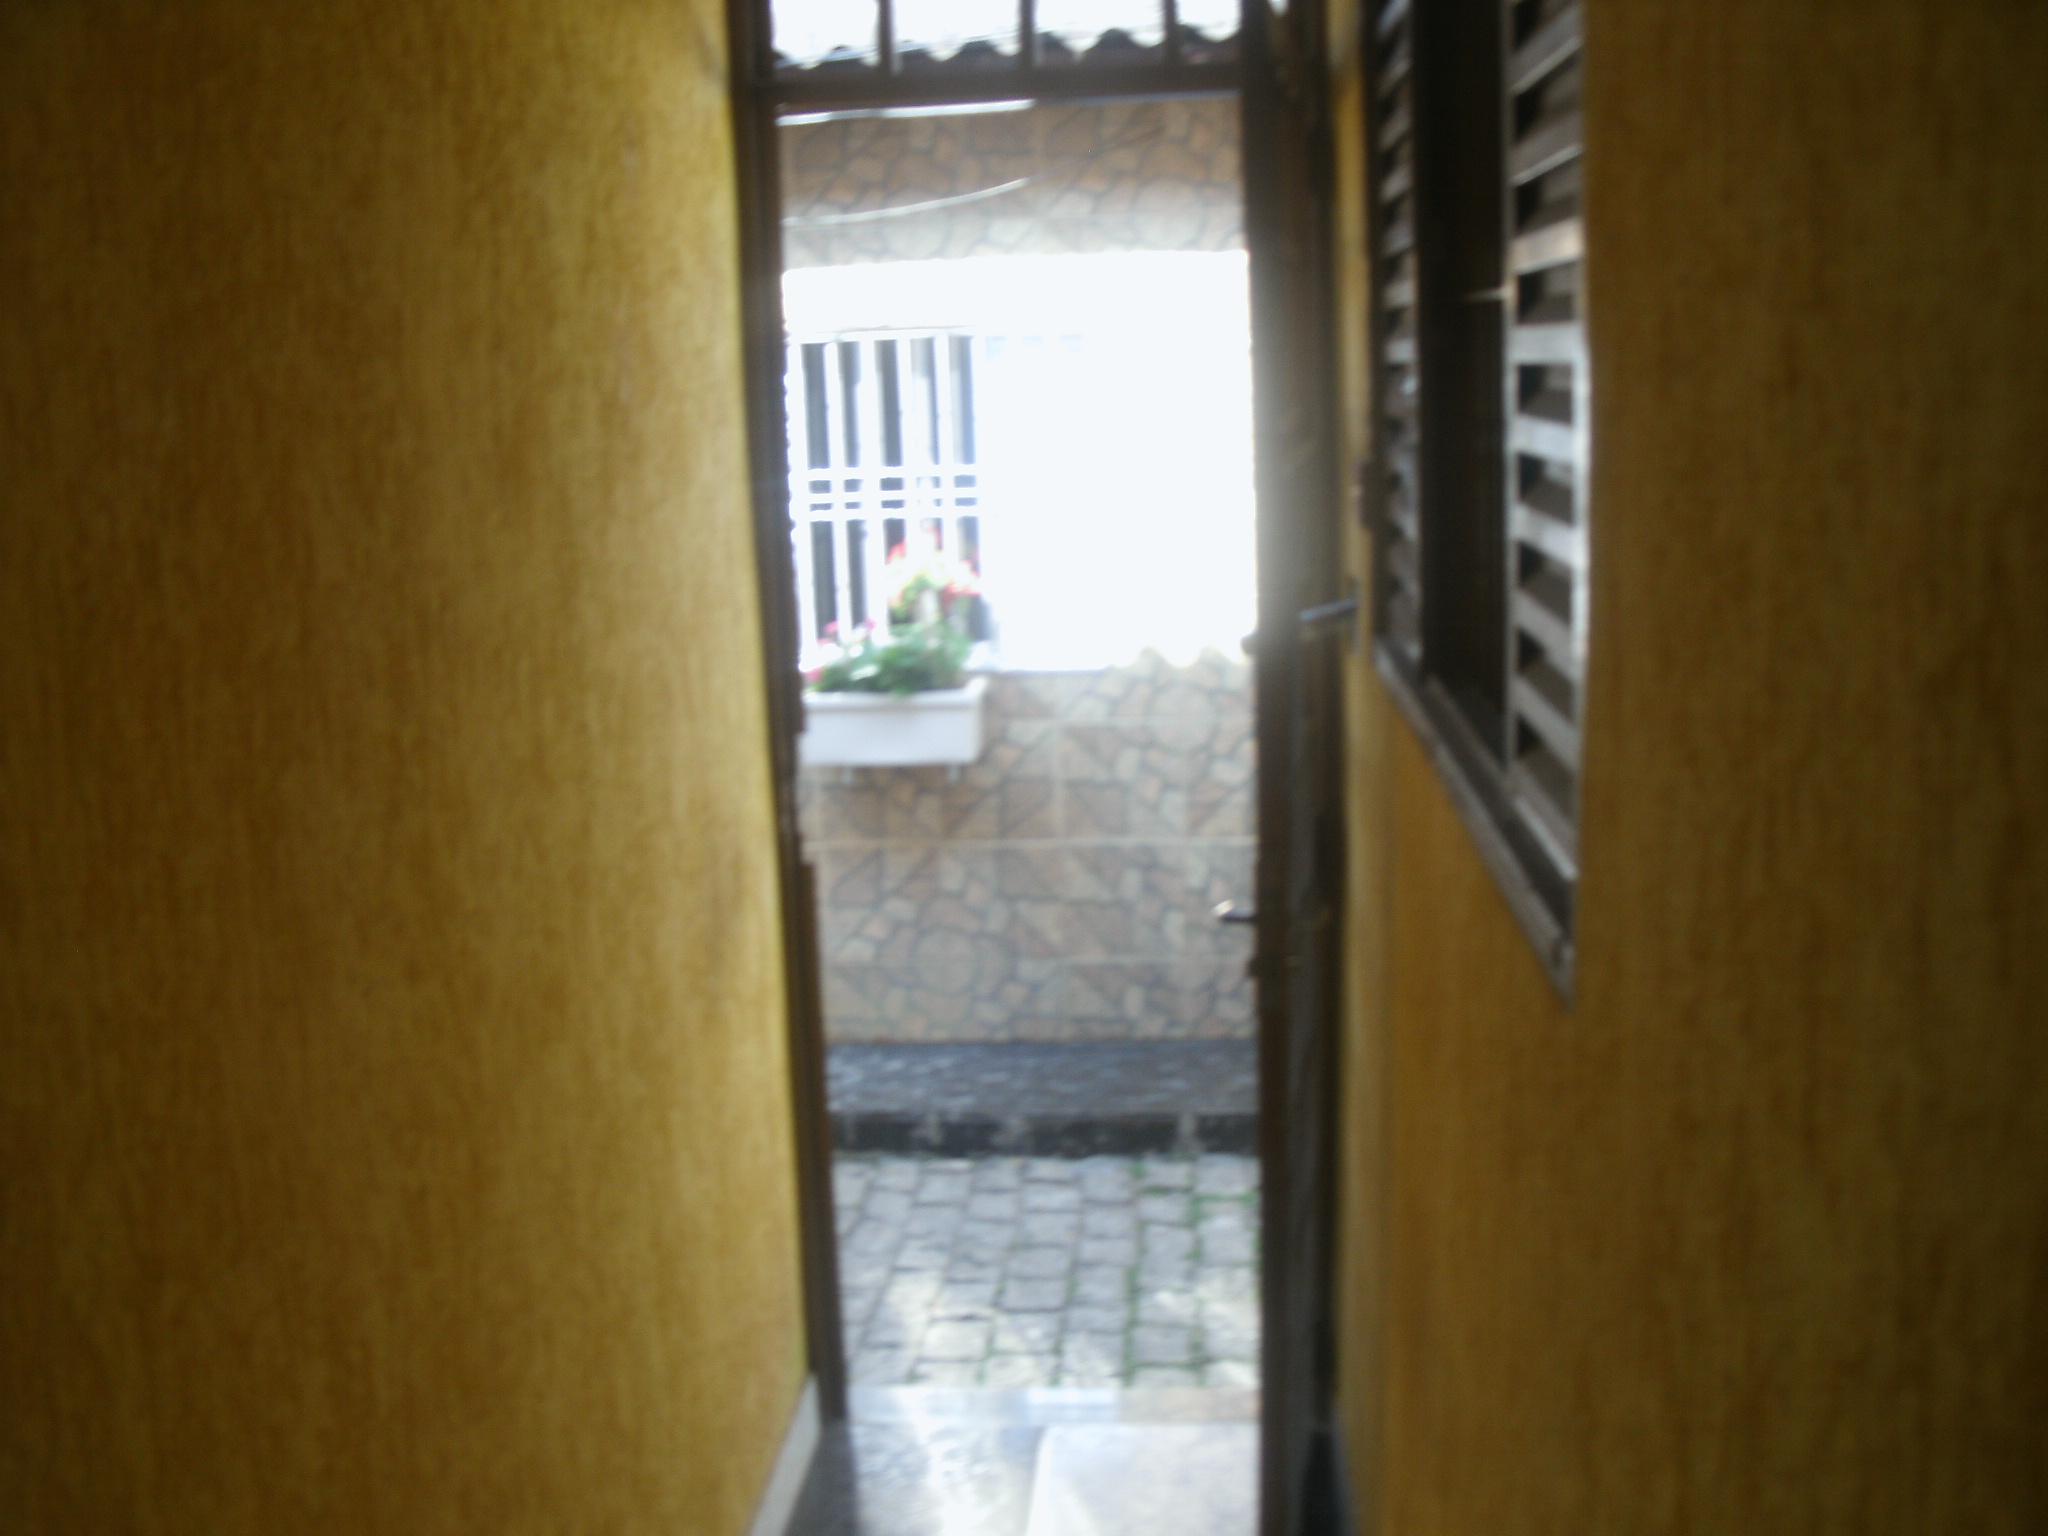 Casa Mogi das cruzes / Centro